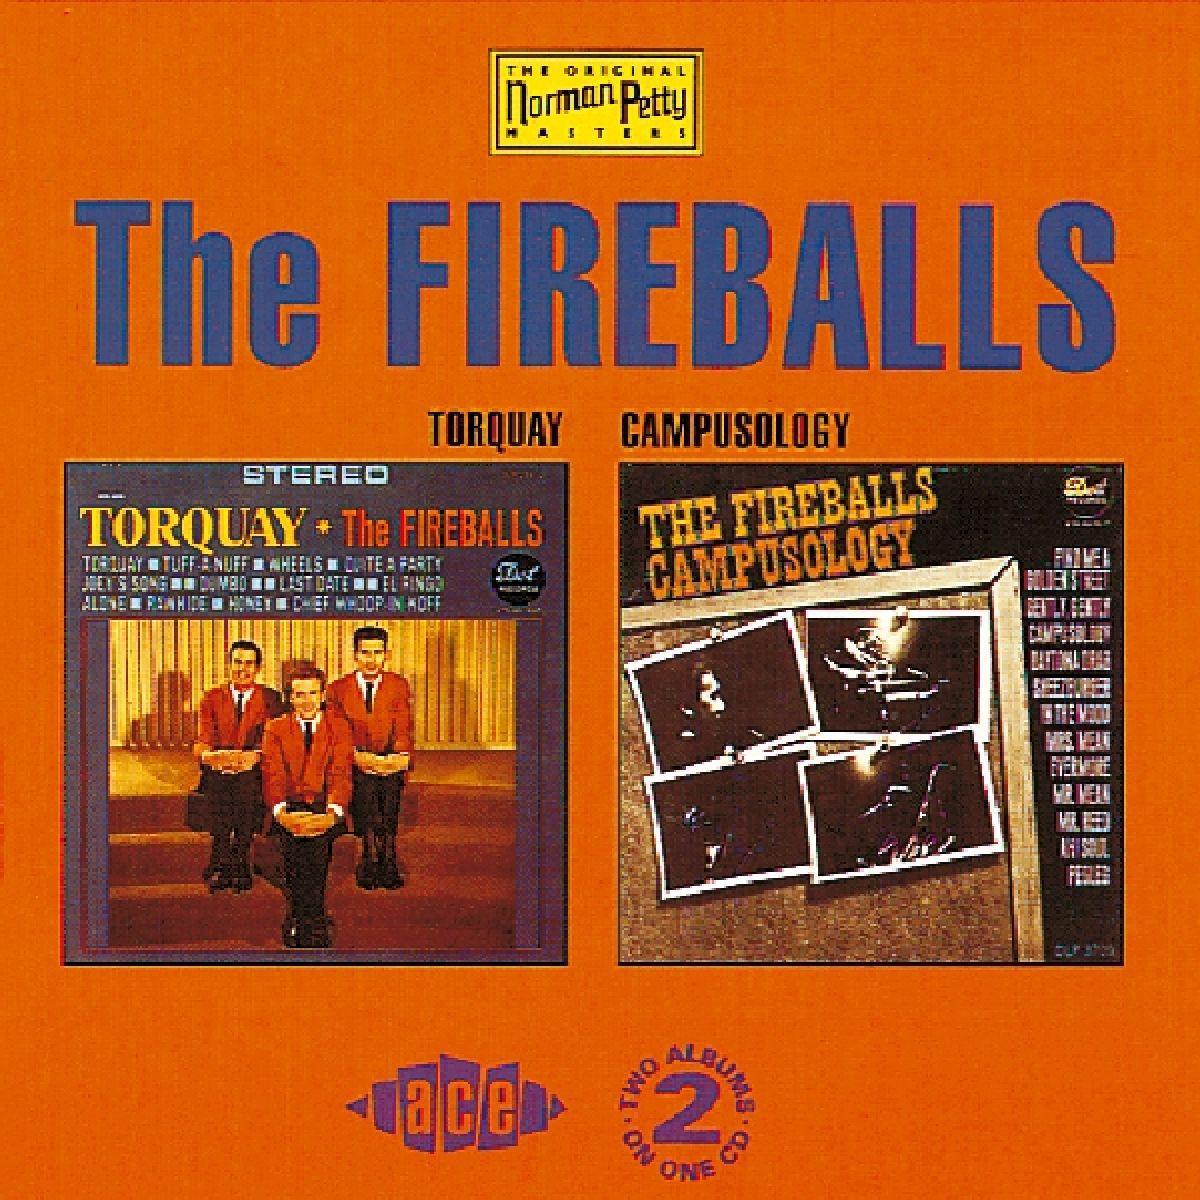 Torquay / Campusology - The Fireballs - Musik - ACE - 0029667145220 - October 19, 1995